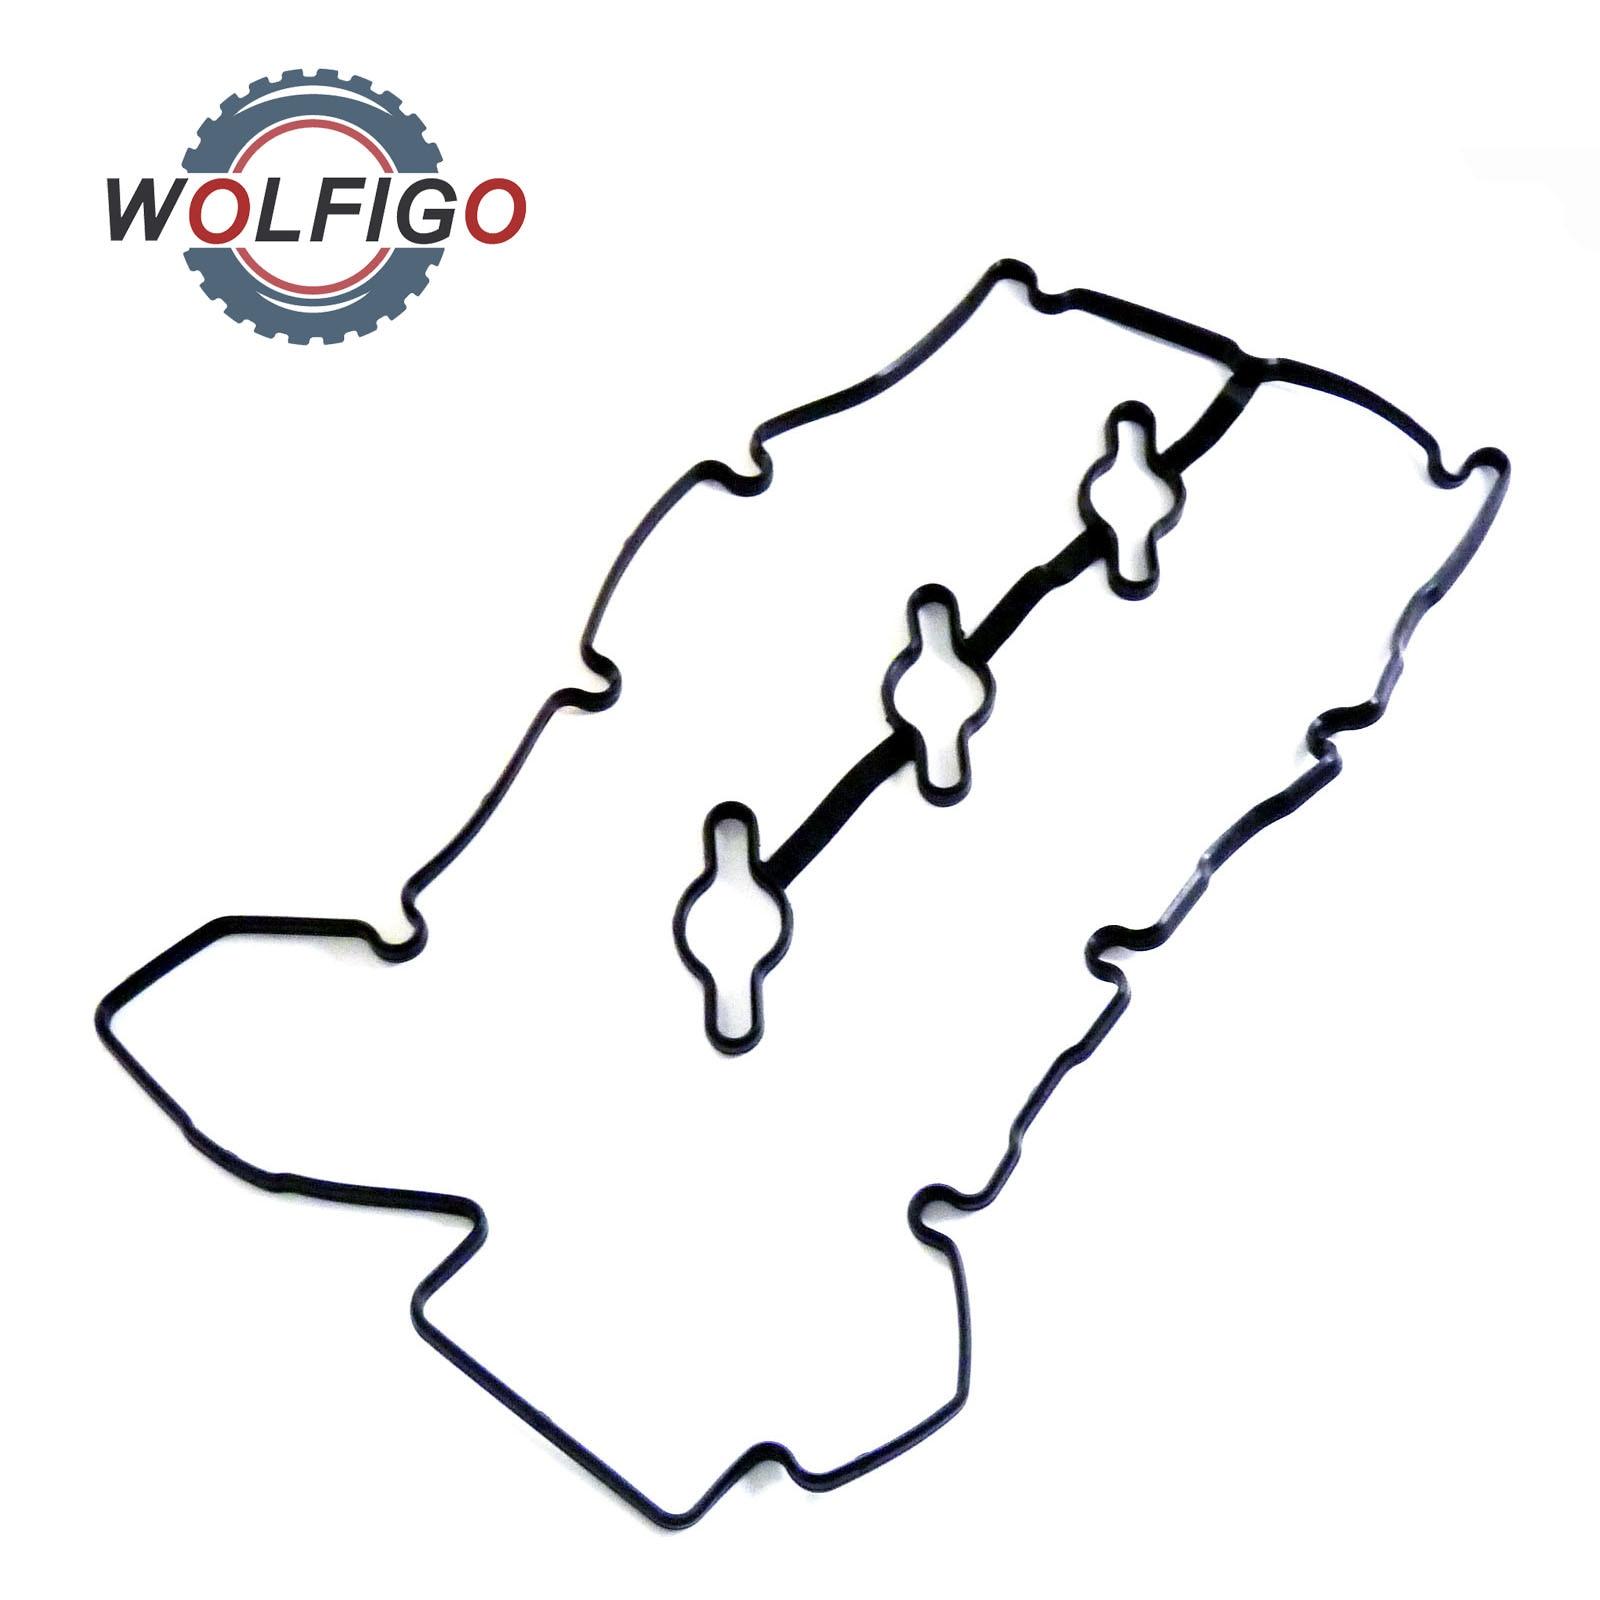 small resolution of wolfigo right engine valve cover gasket 22441 3c110 vs50750r for hyundai azera kia sorento new